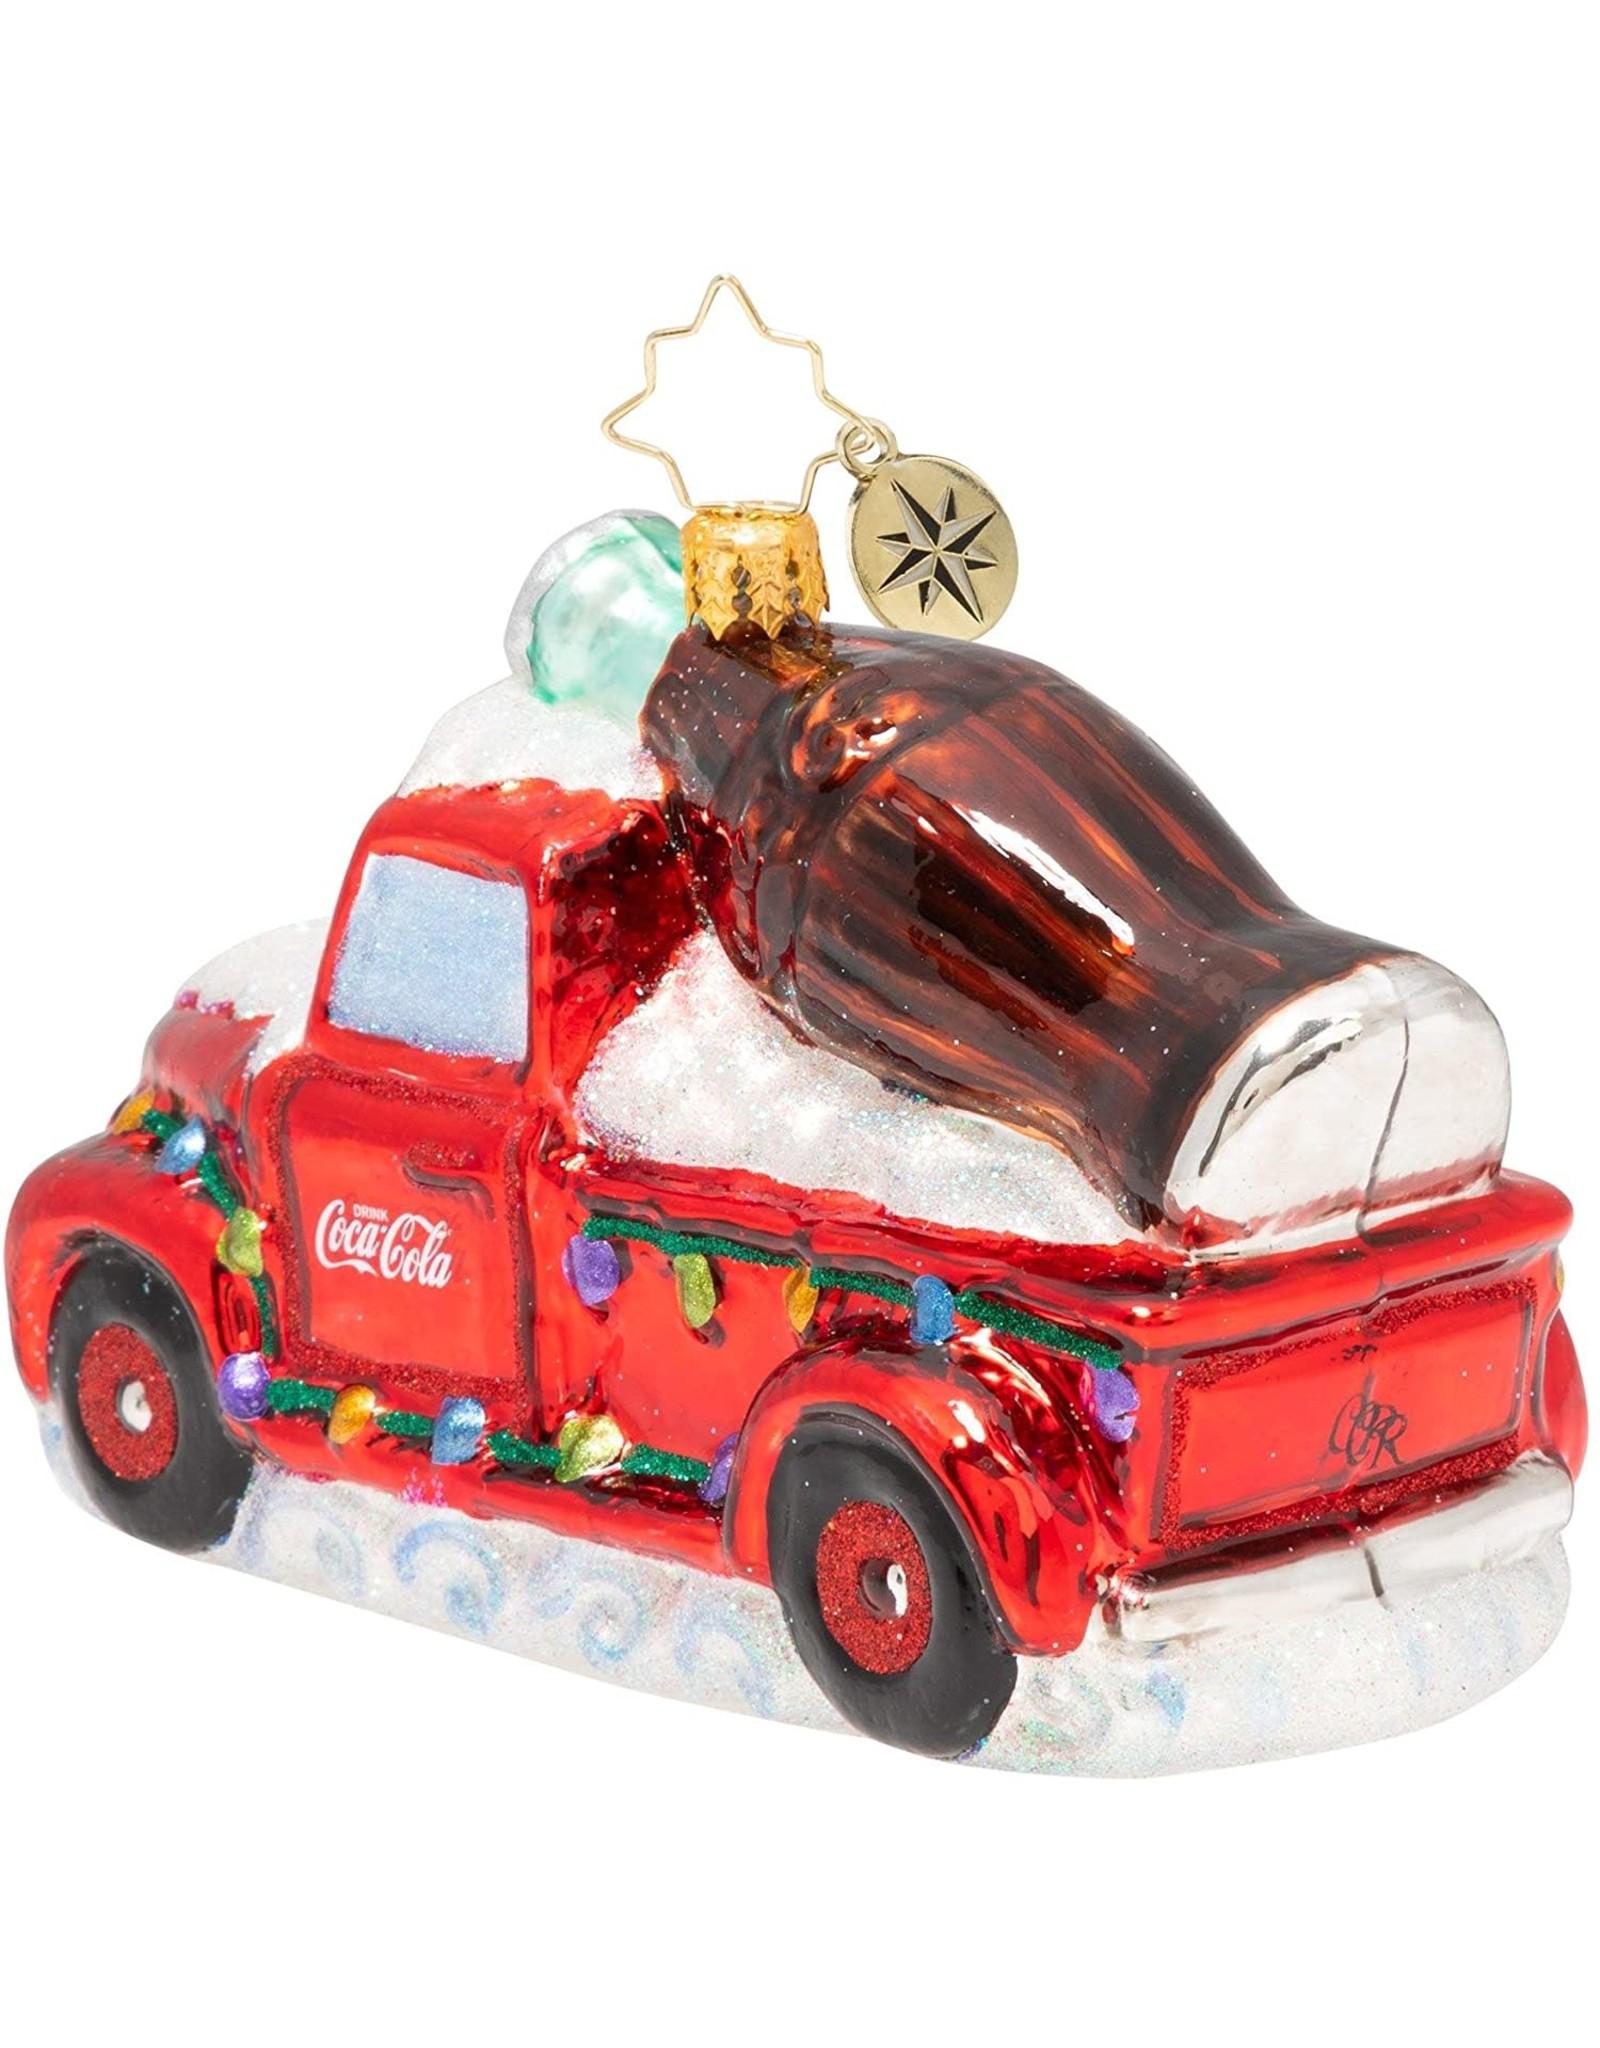 Christopher Radko A Coca-Cola Celebration Ornament